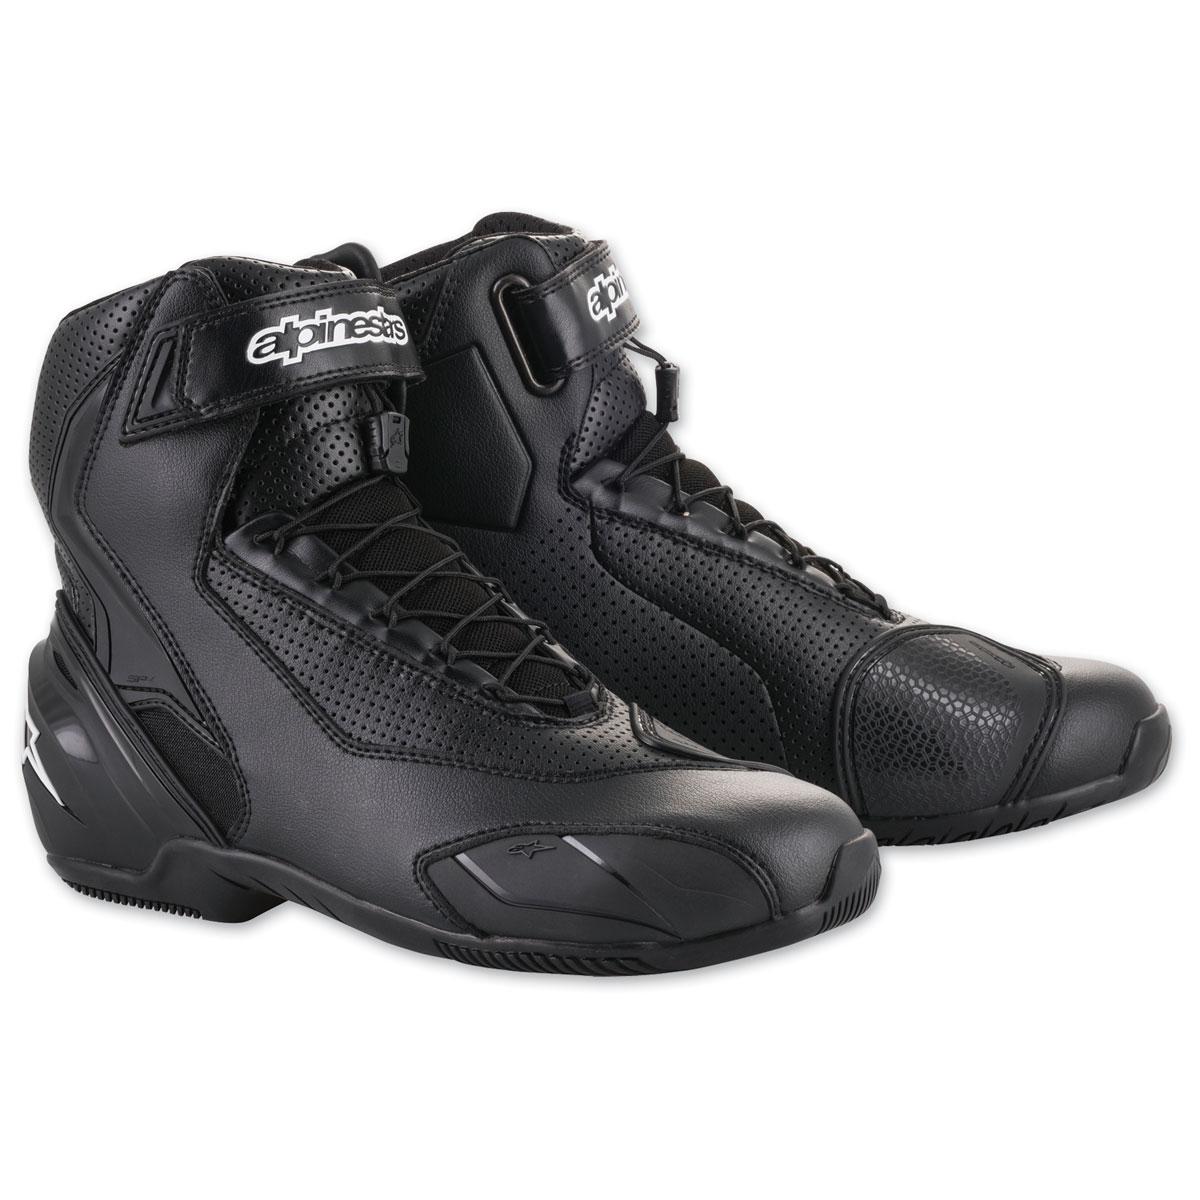 Alpinestars Men's SP-1 v2 Vented Black/Black Boots